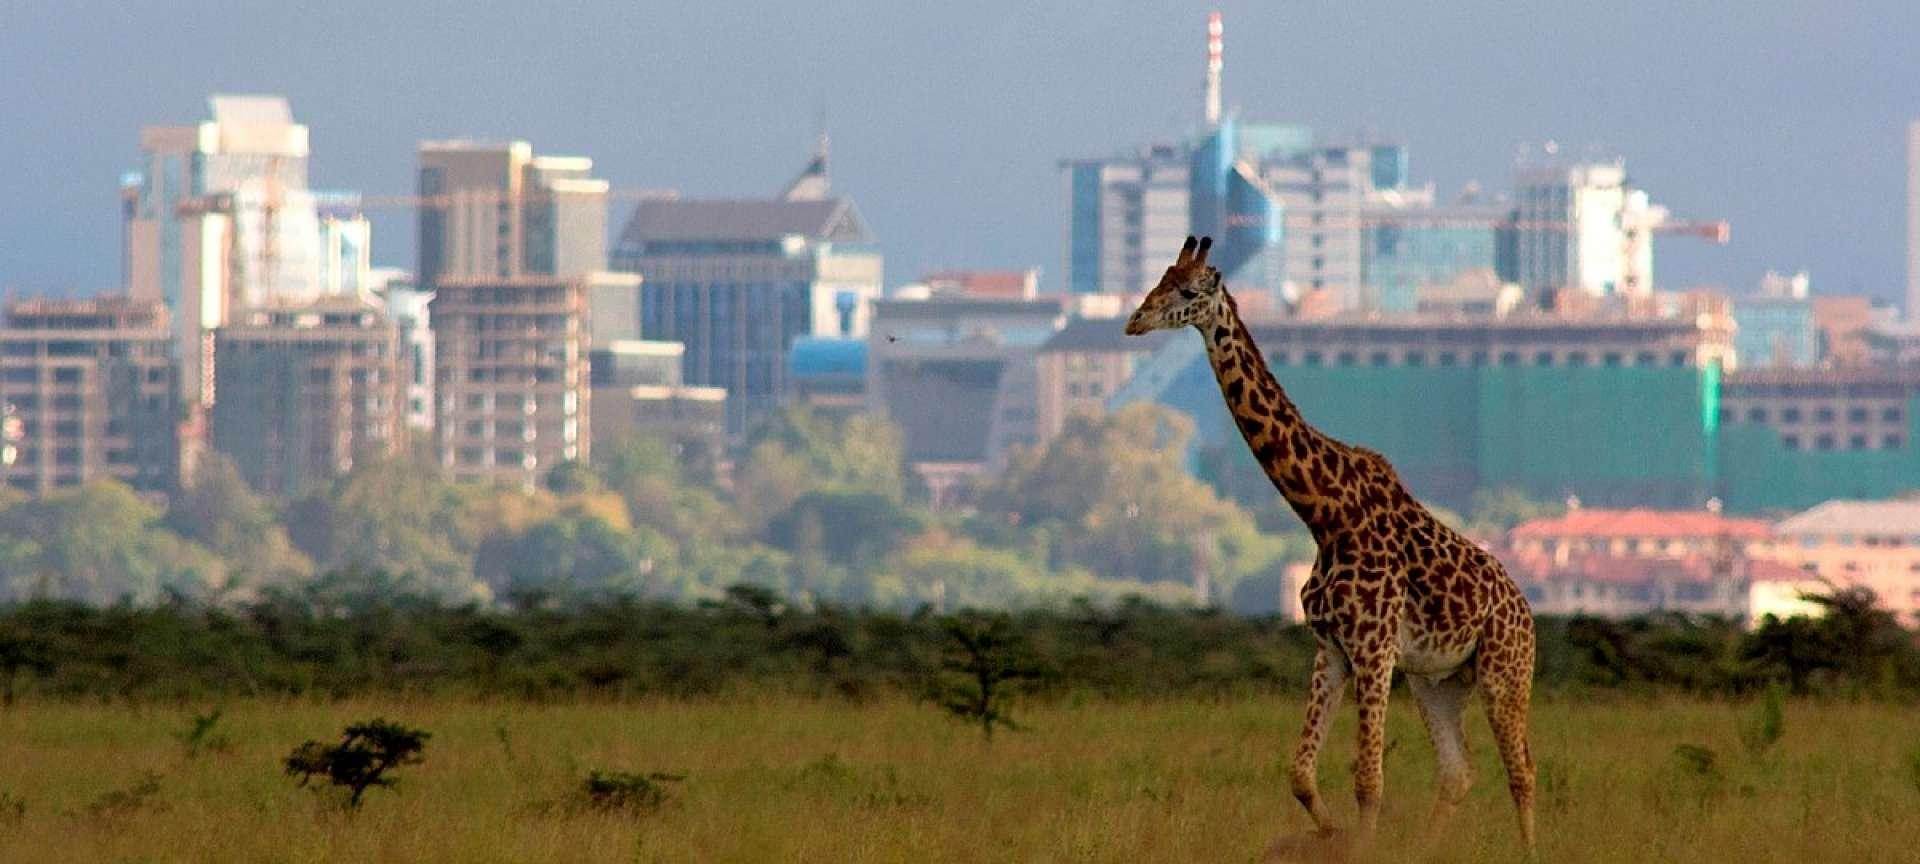 Nairobi National Park - Africa Wildlife Safaris